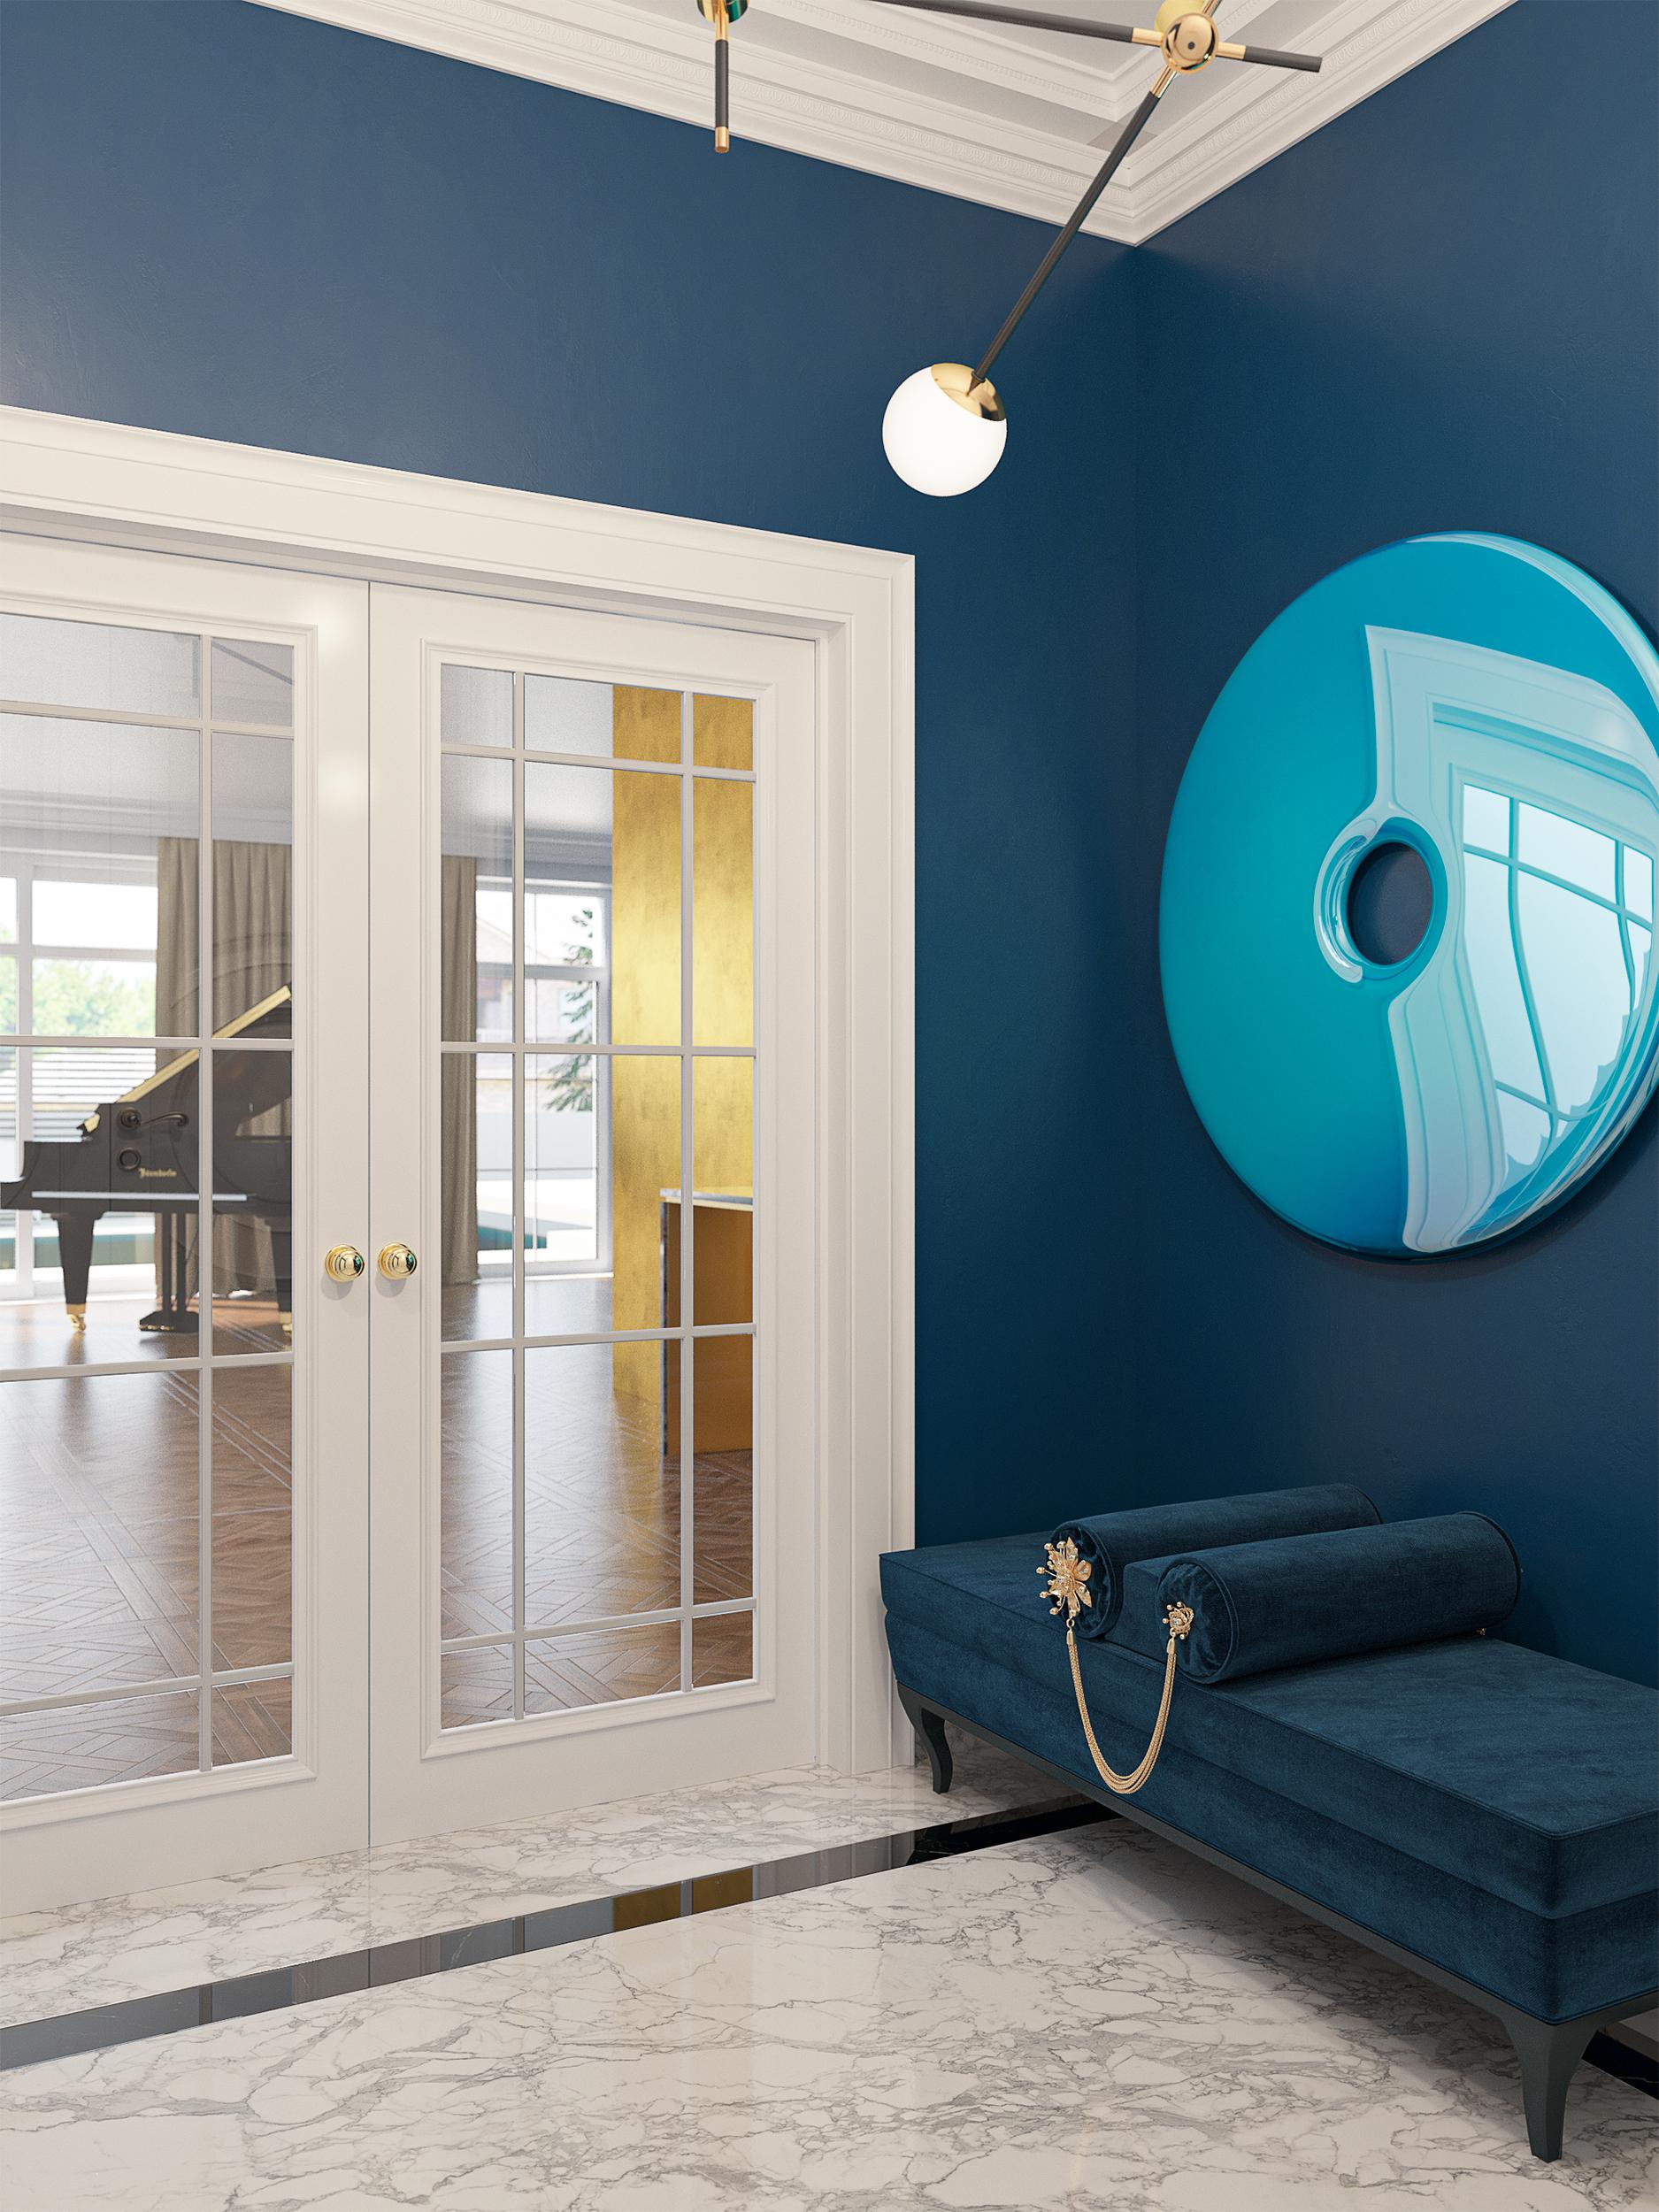 hallway-studio-artup-interiors-le-le-bench